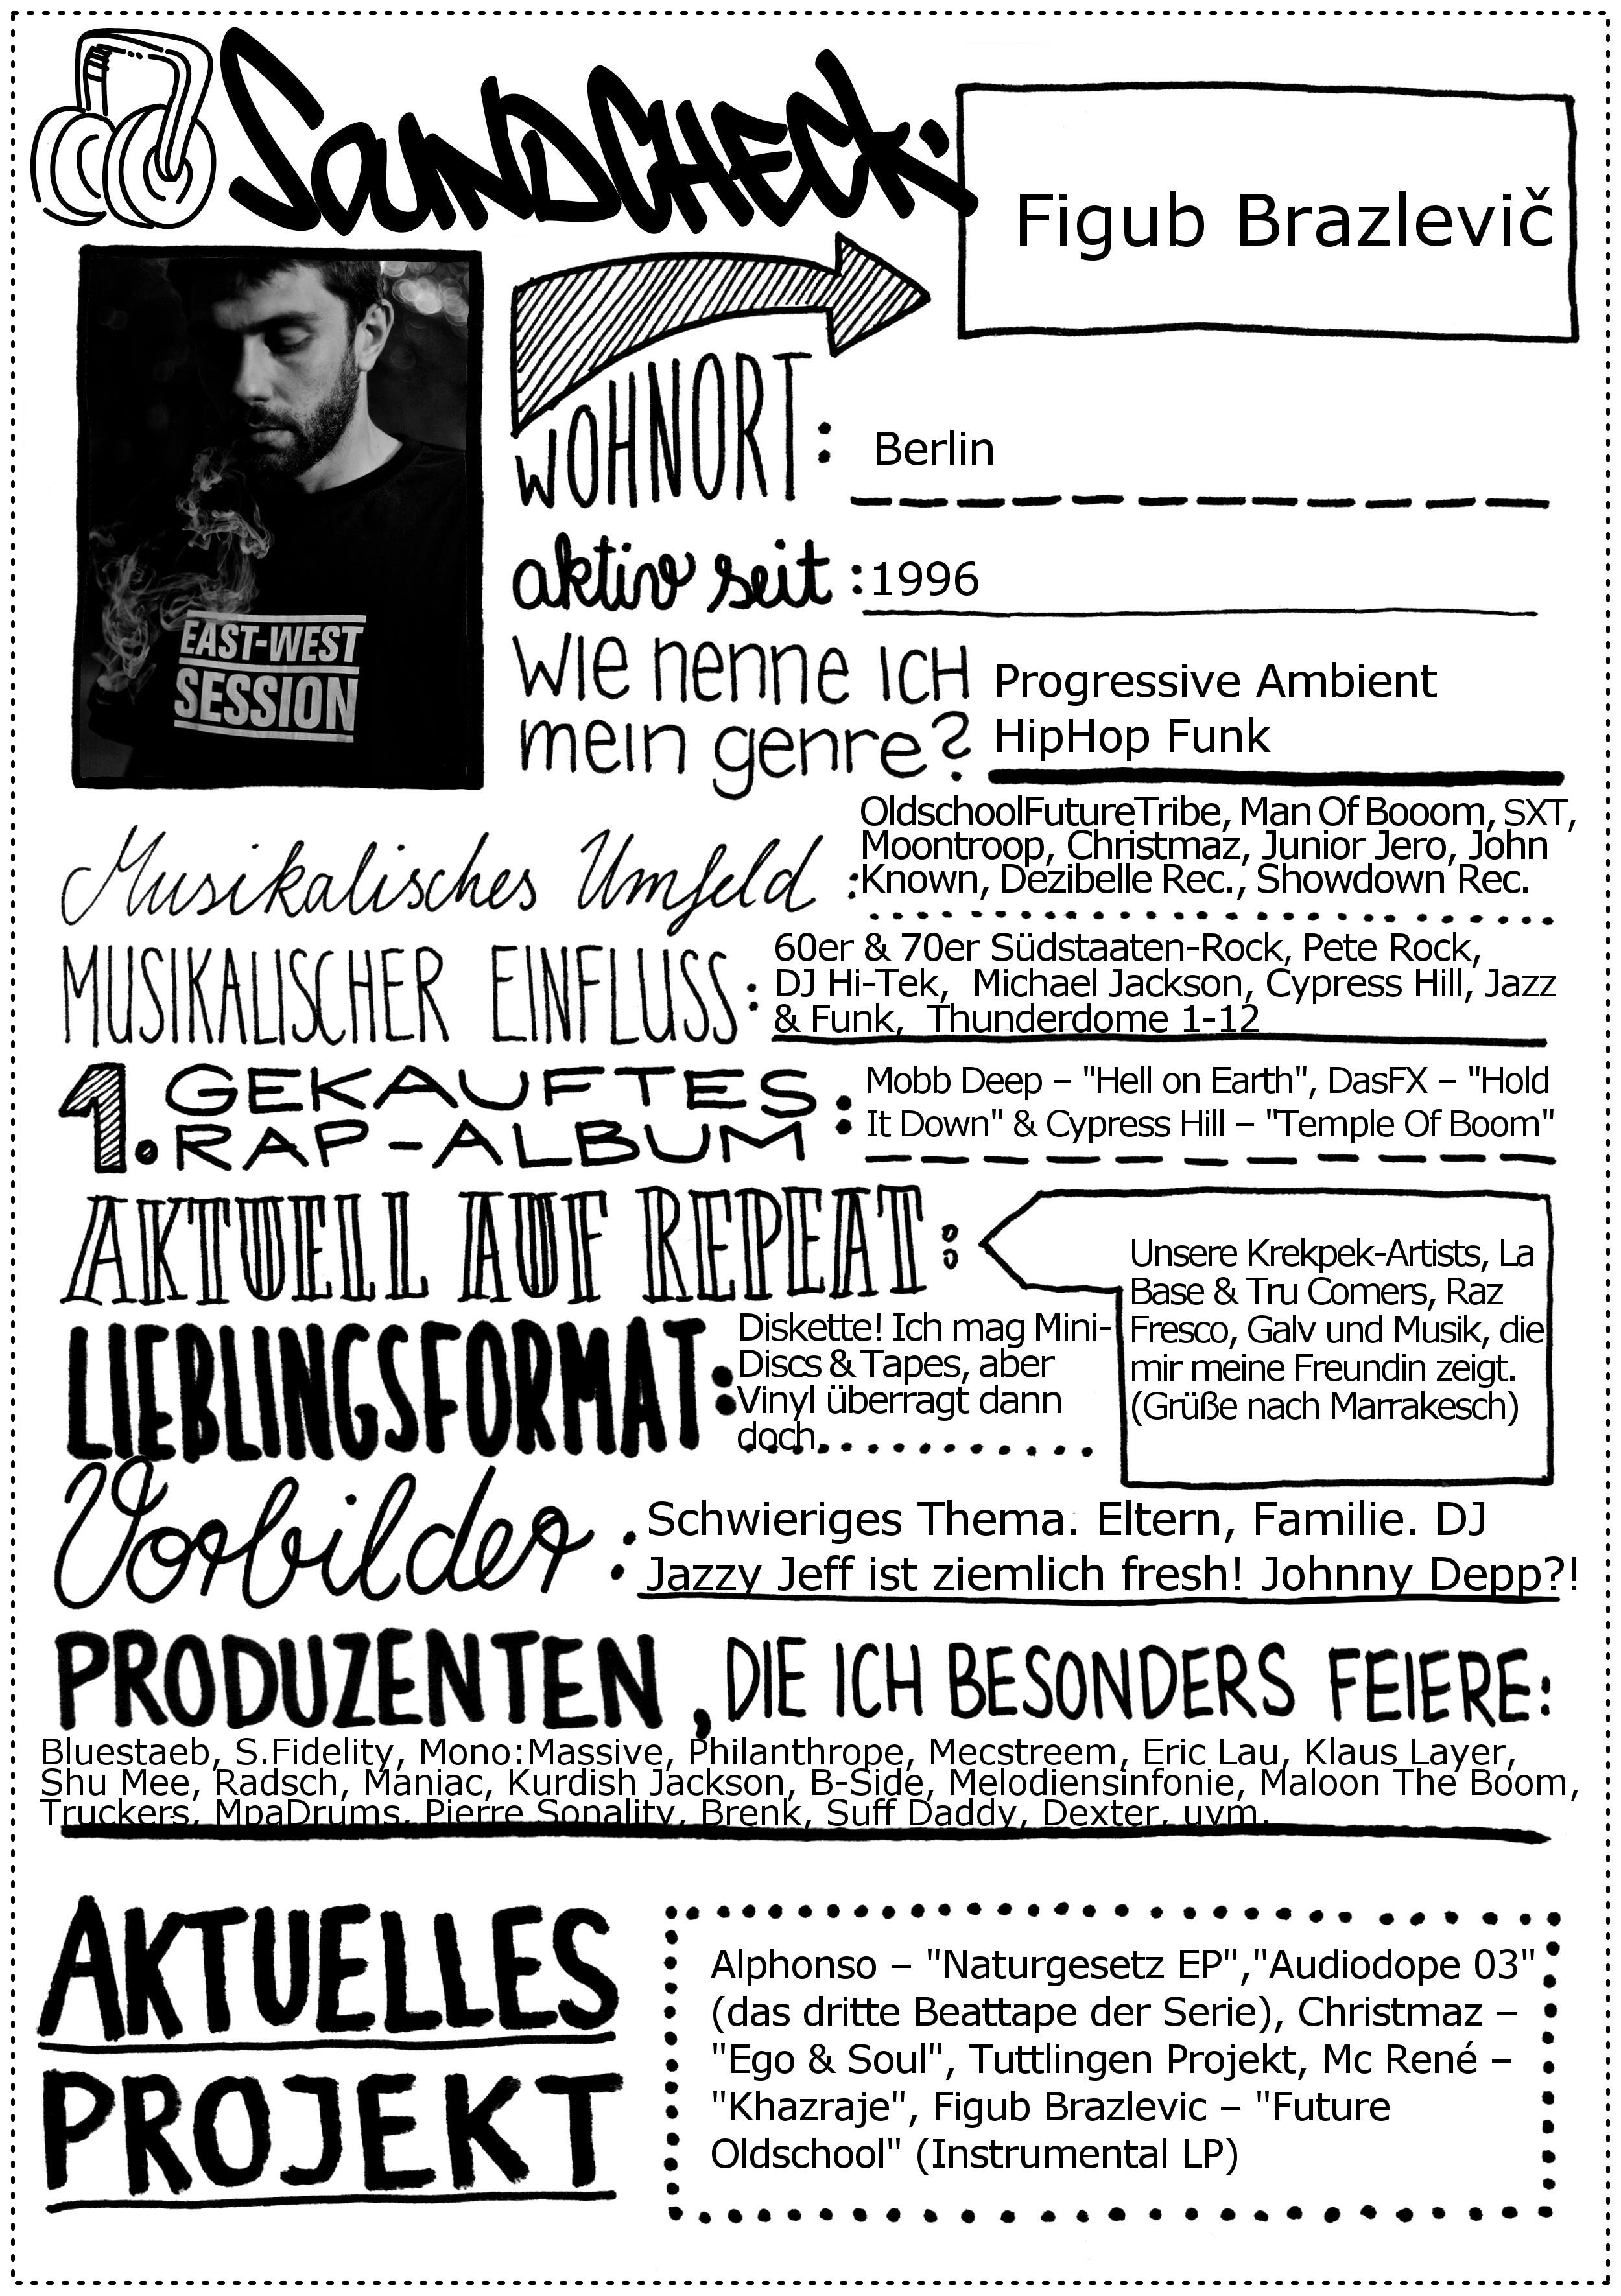 SoundcheckFormular_FIGUB